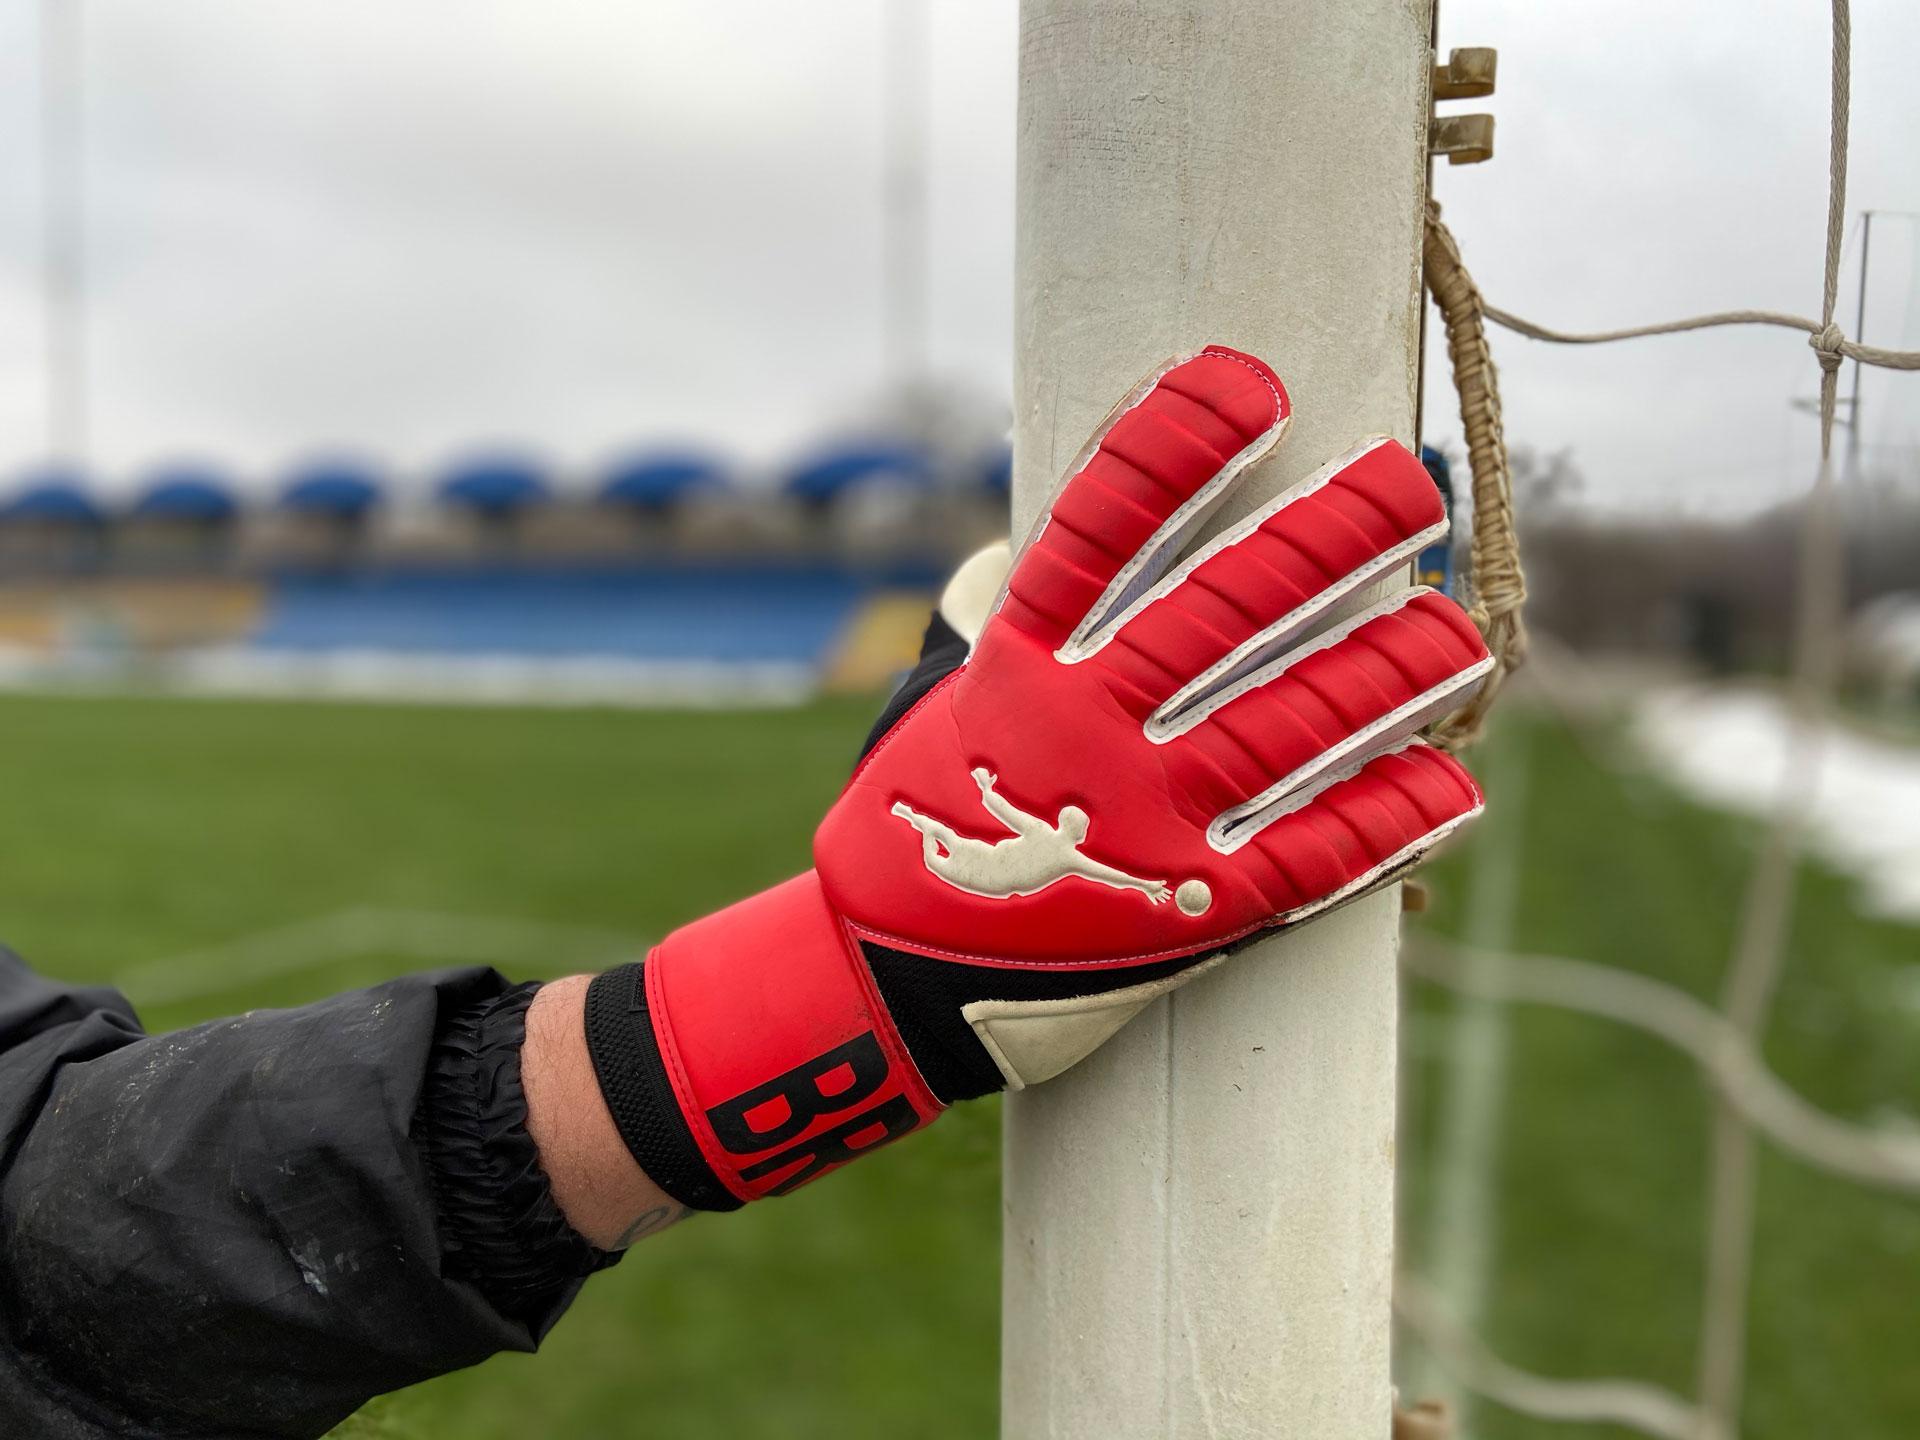 Авторські воротарські рукавиці Brave GK Skill - официальный интернет-магазин Brave GK